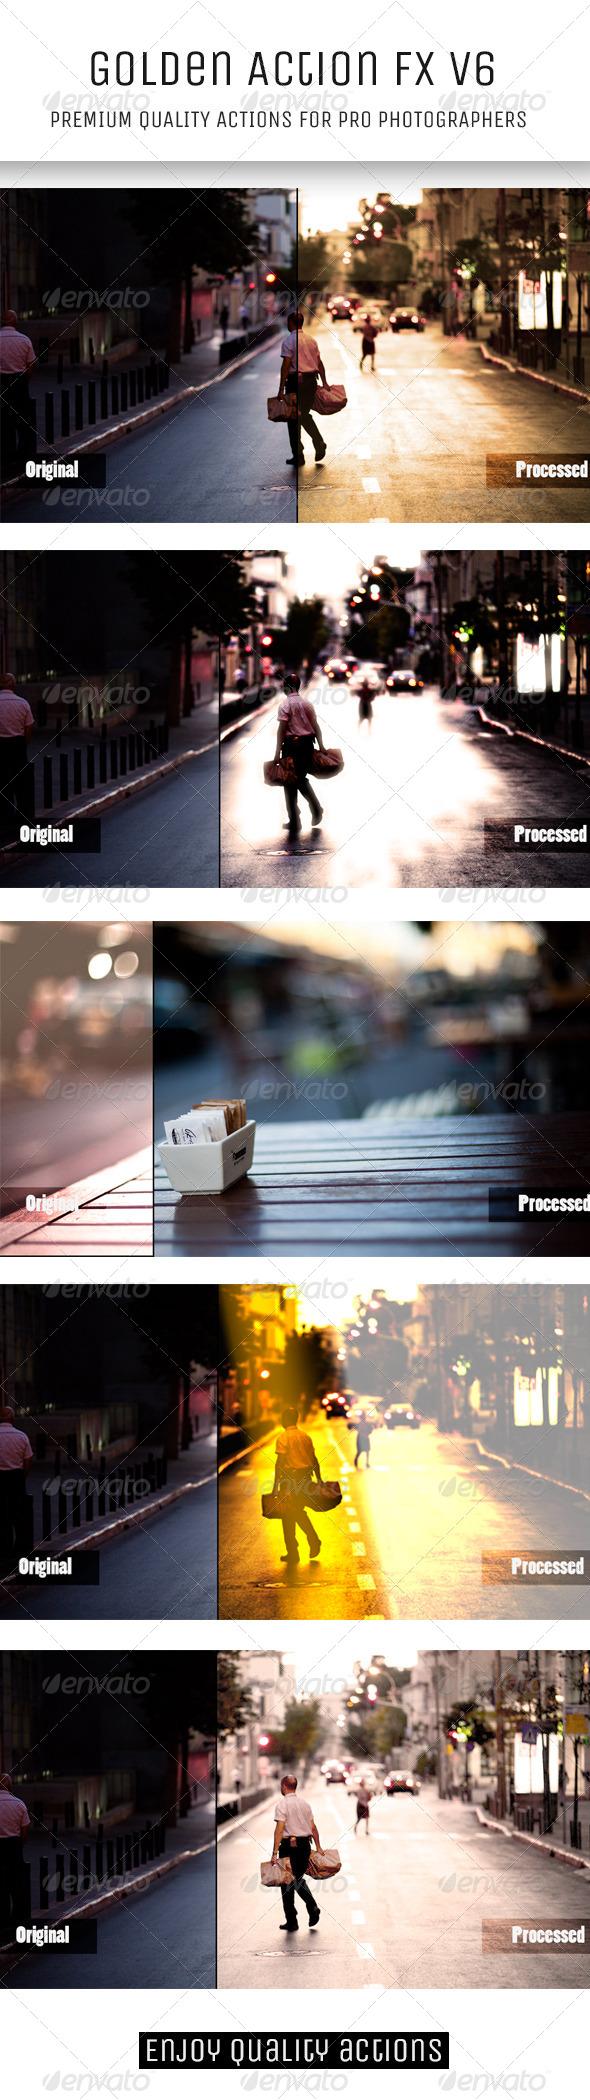 GraphicRiver Golden Action FX V6 5734877